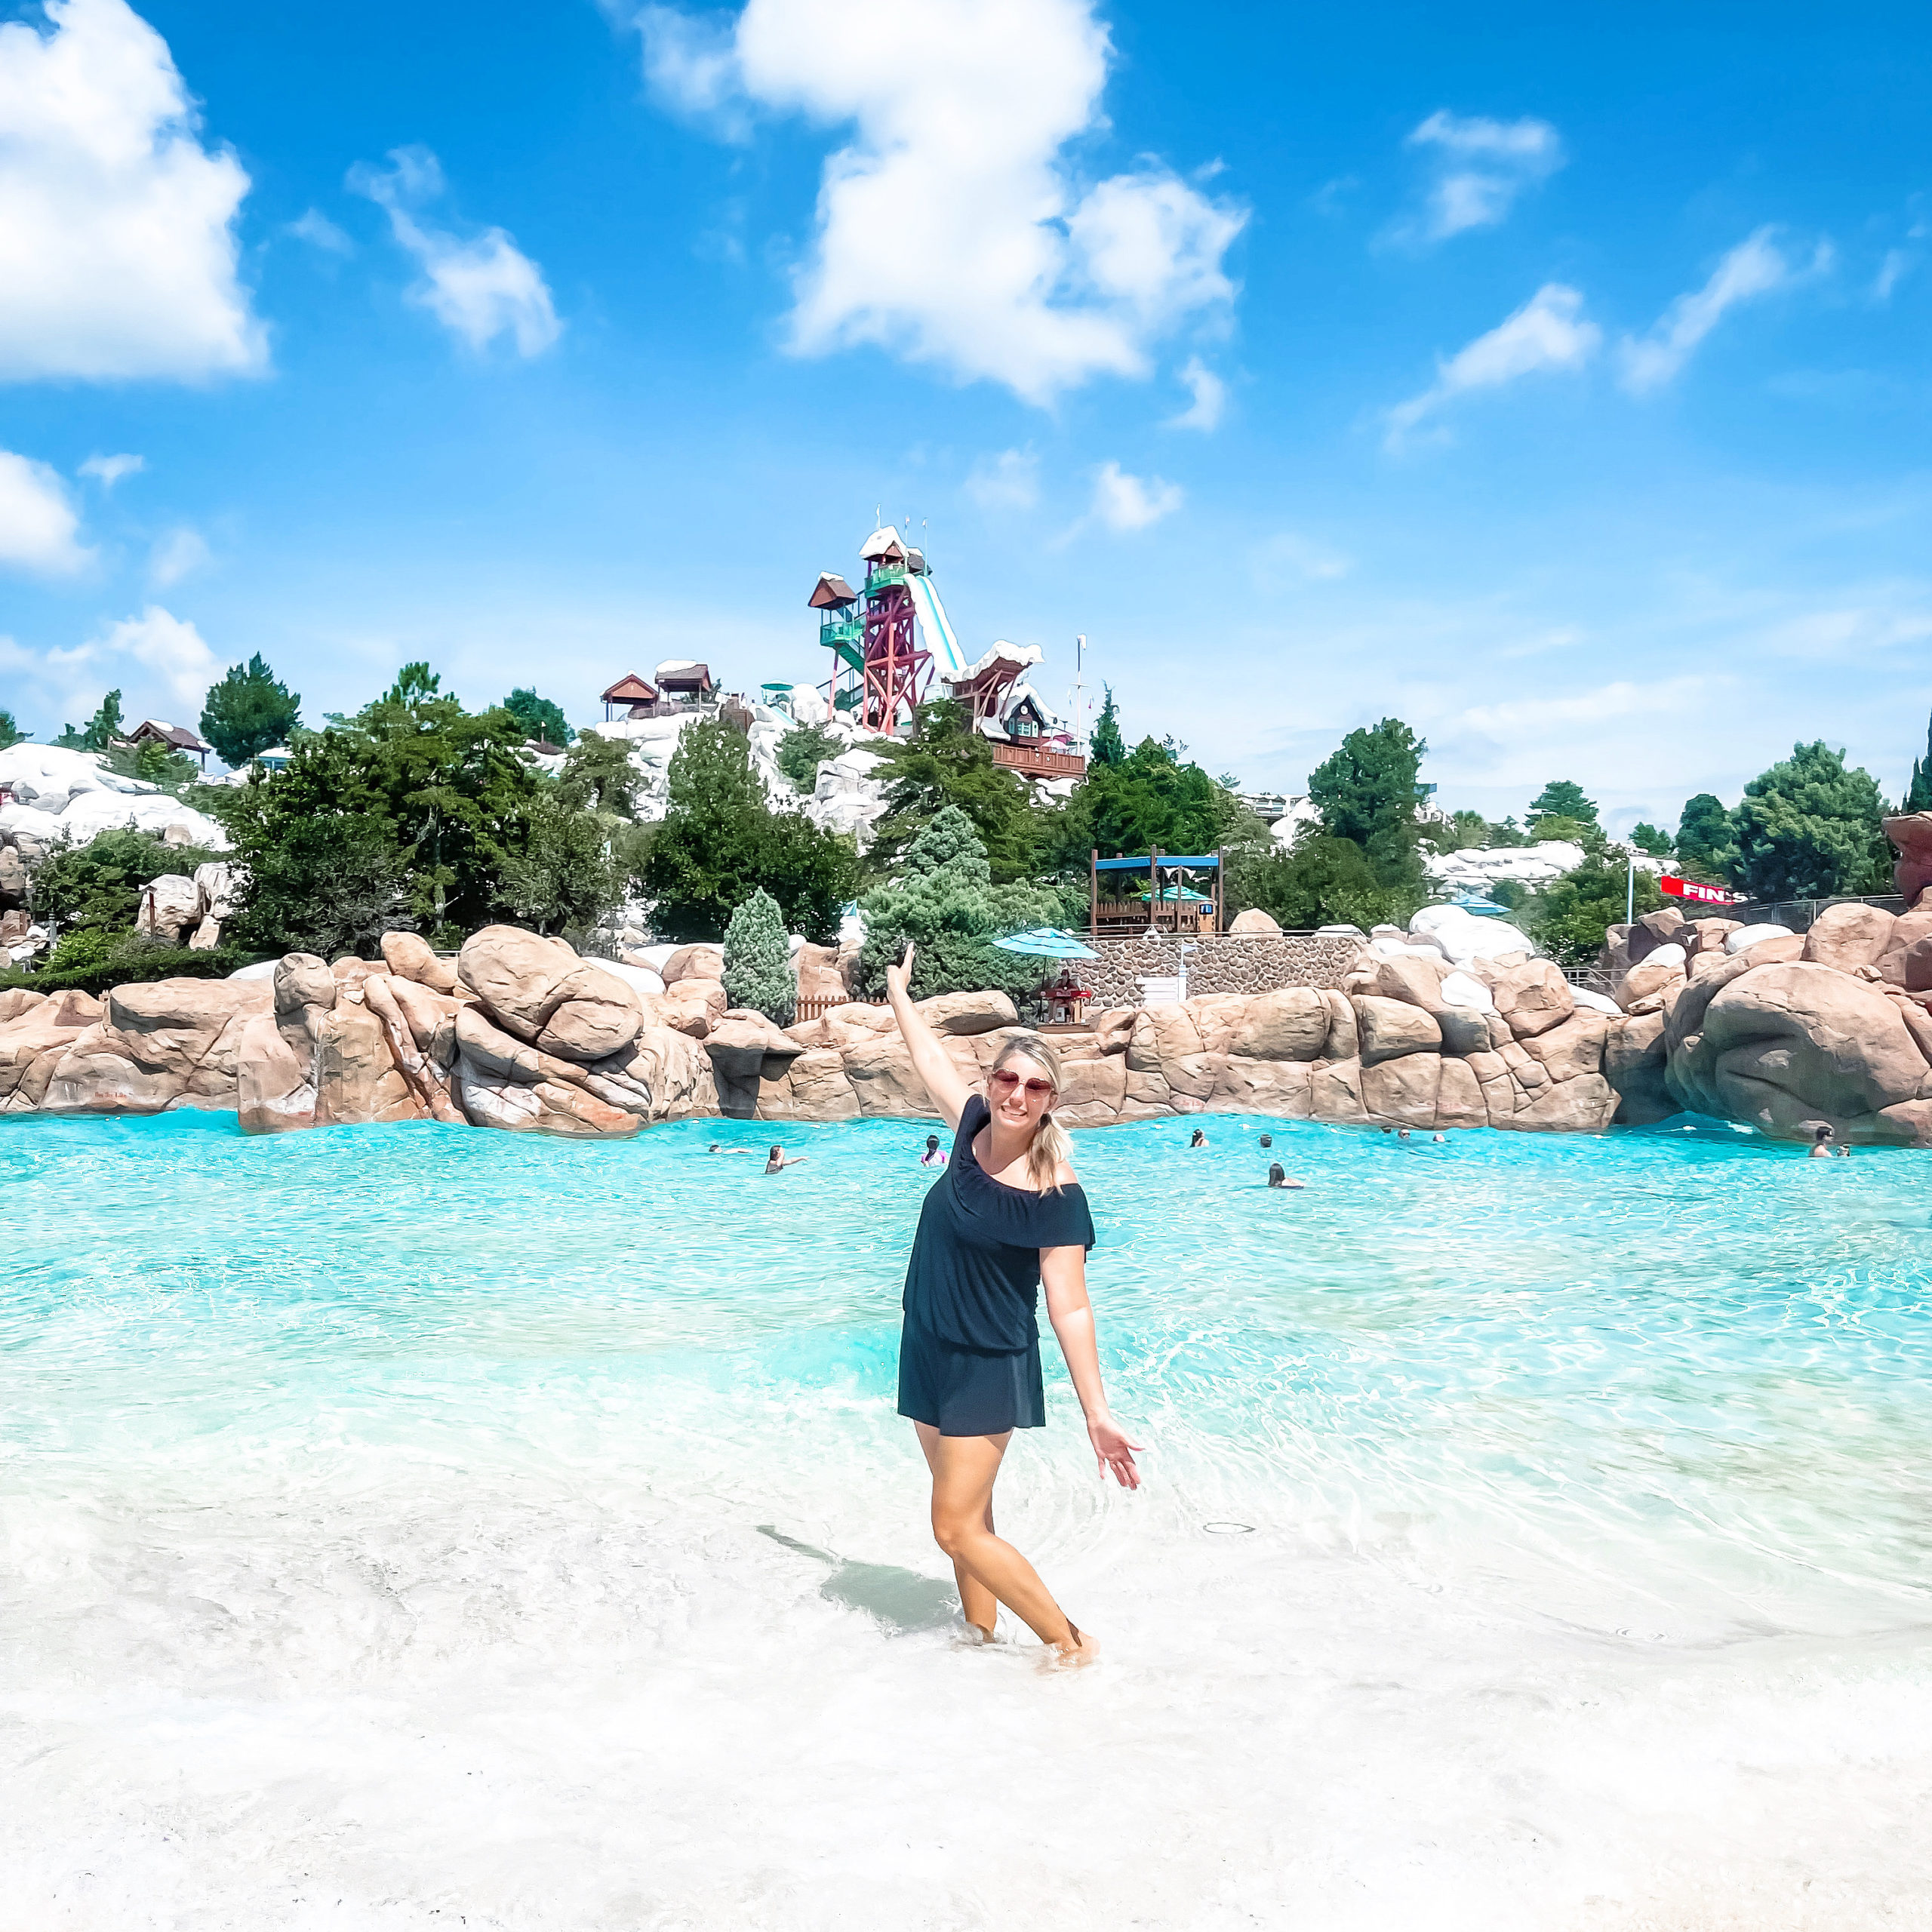 5 Reasons We Love Disney's Blizzard Beach Water Park